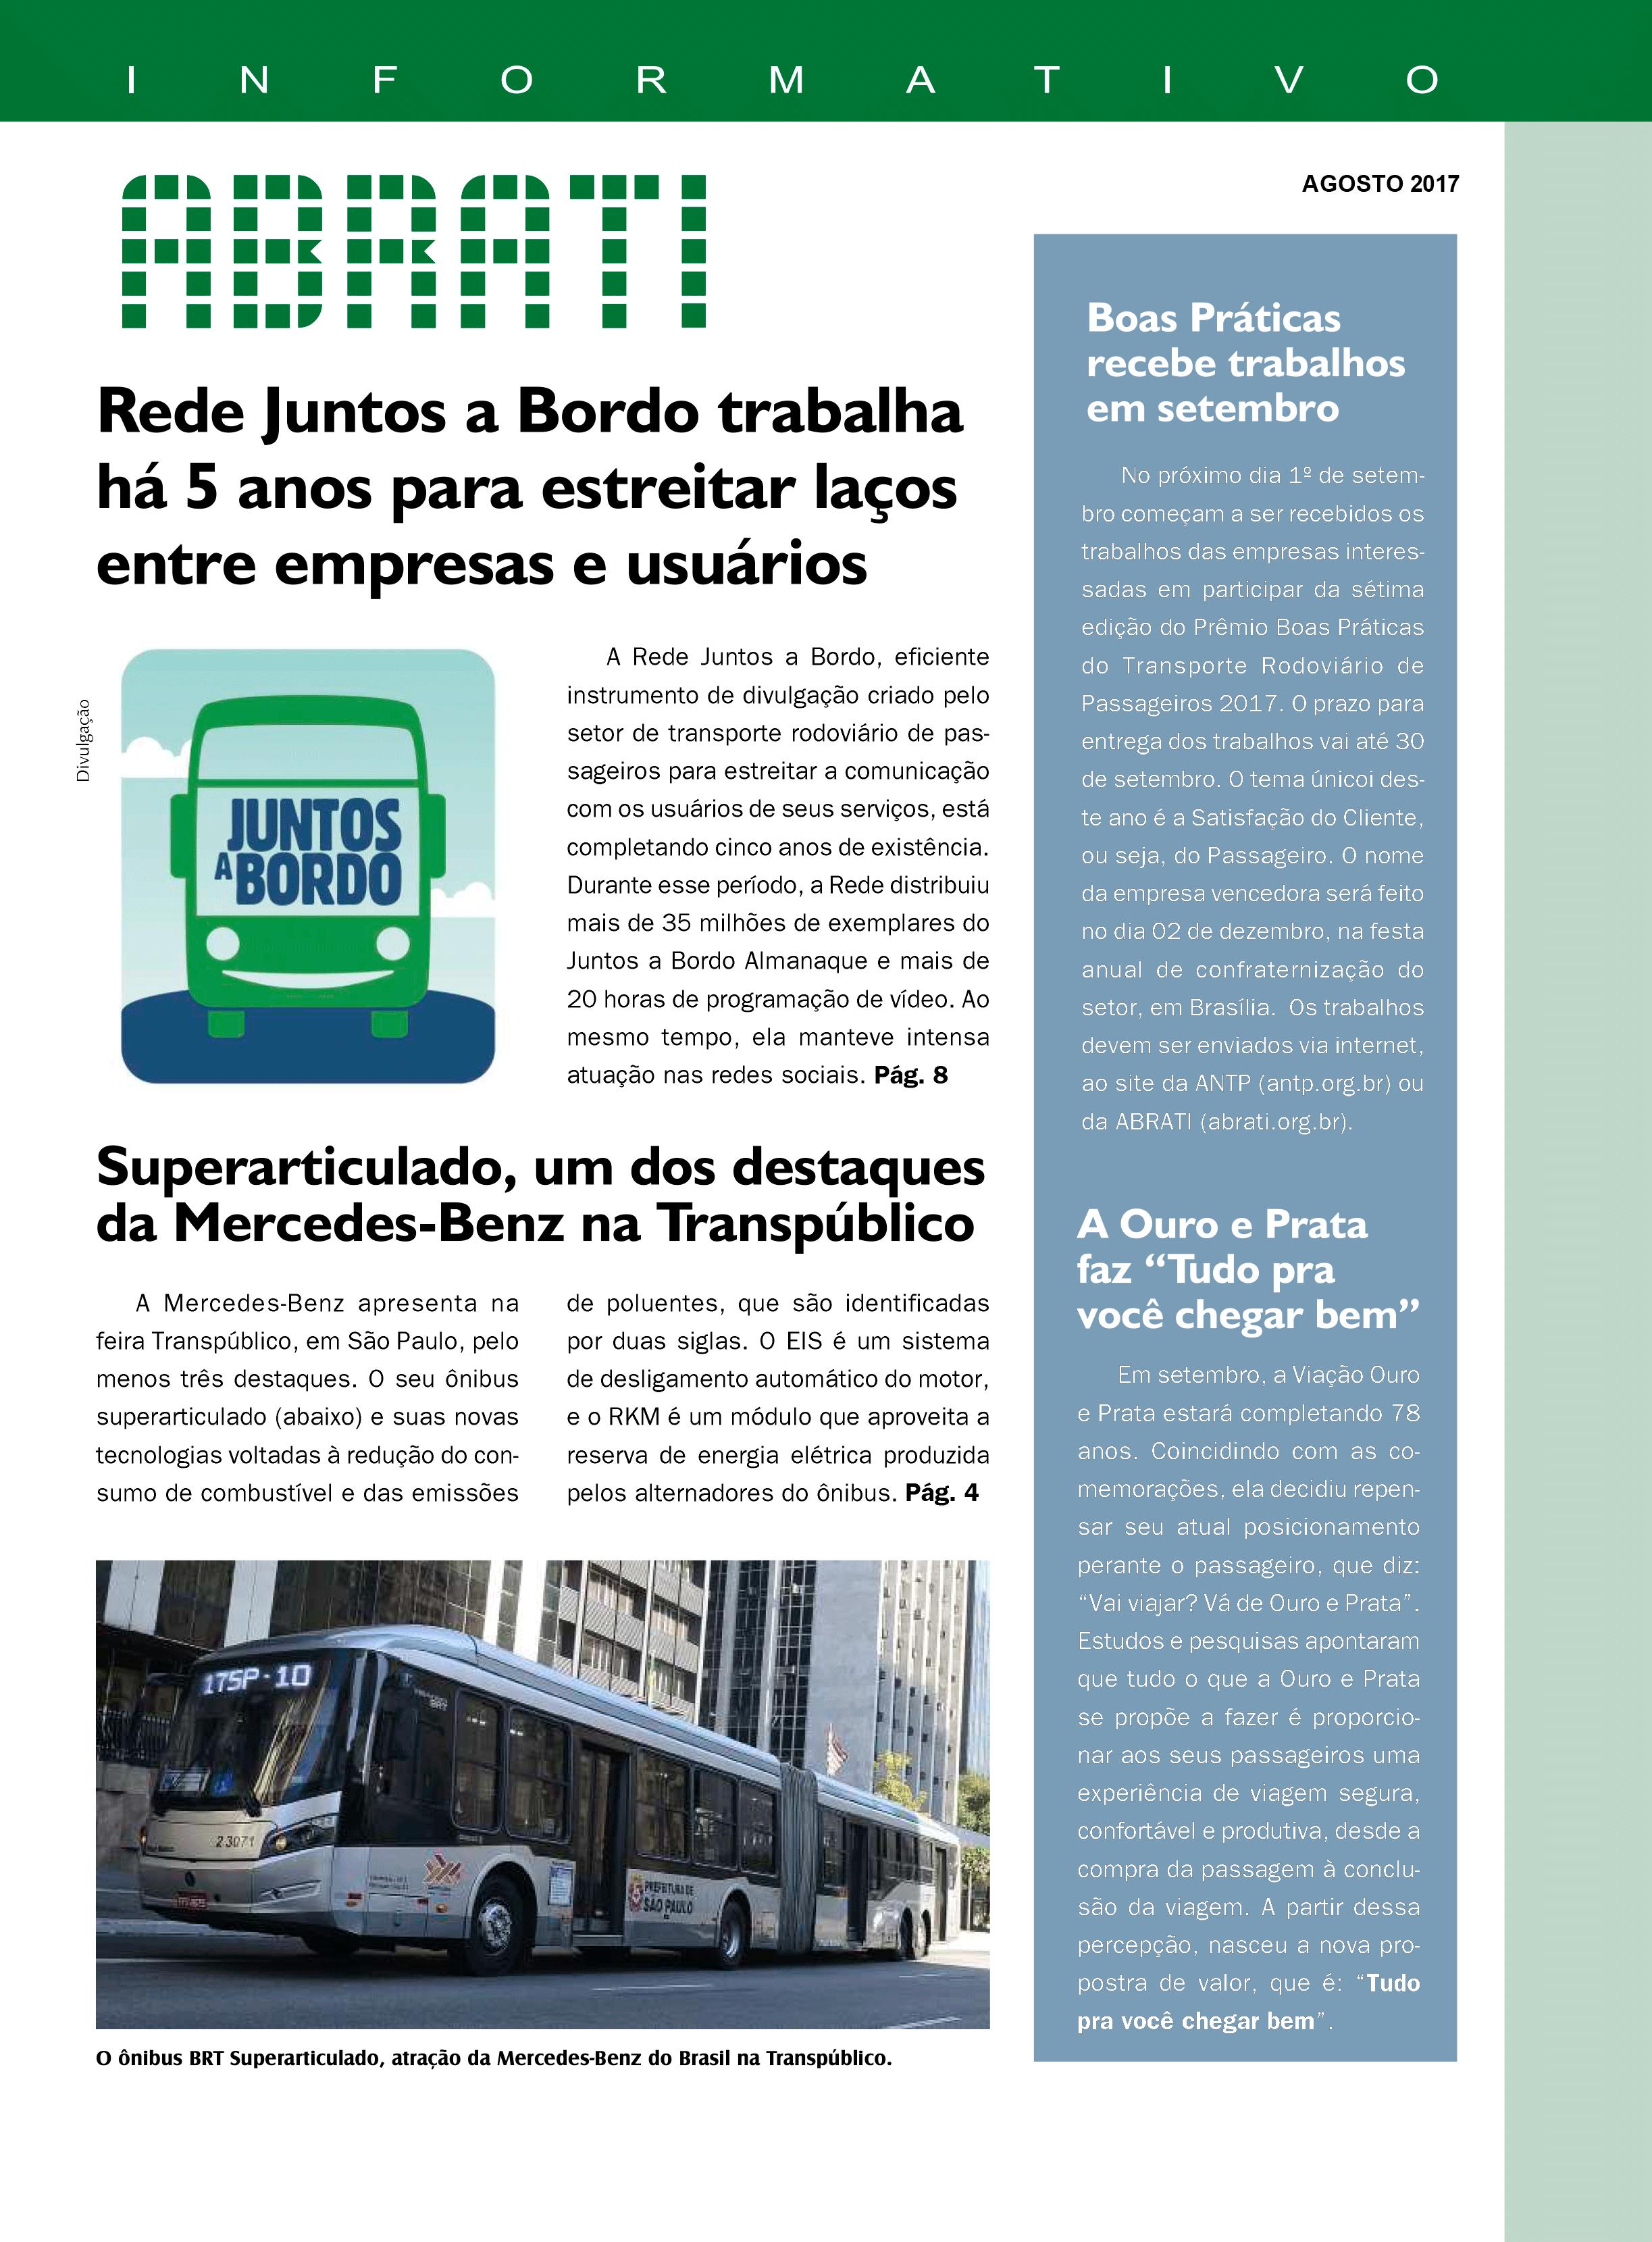 Informativo Agosto 2017